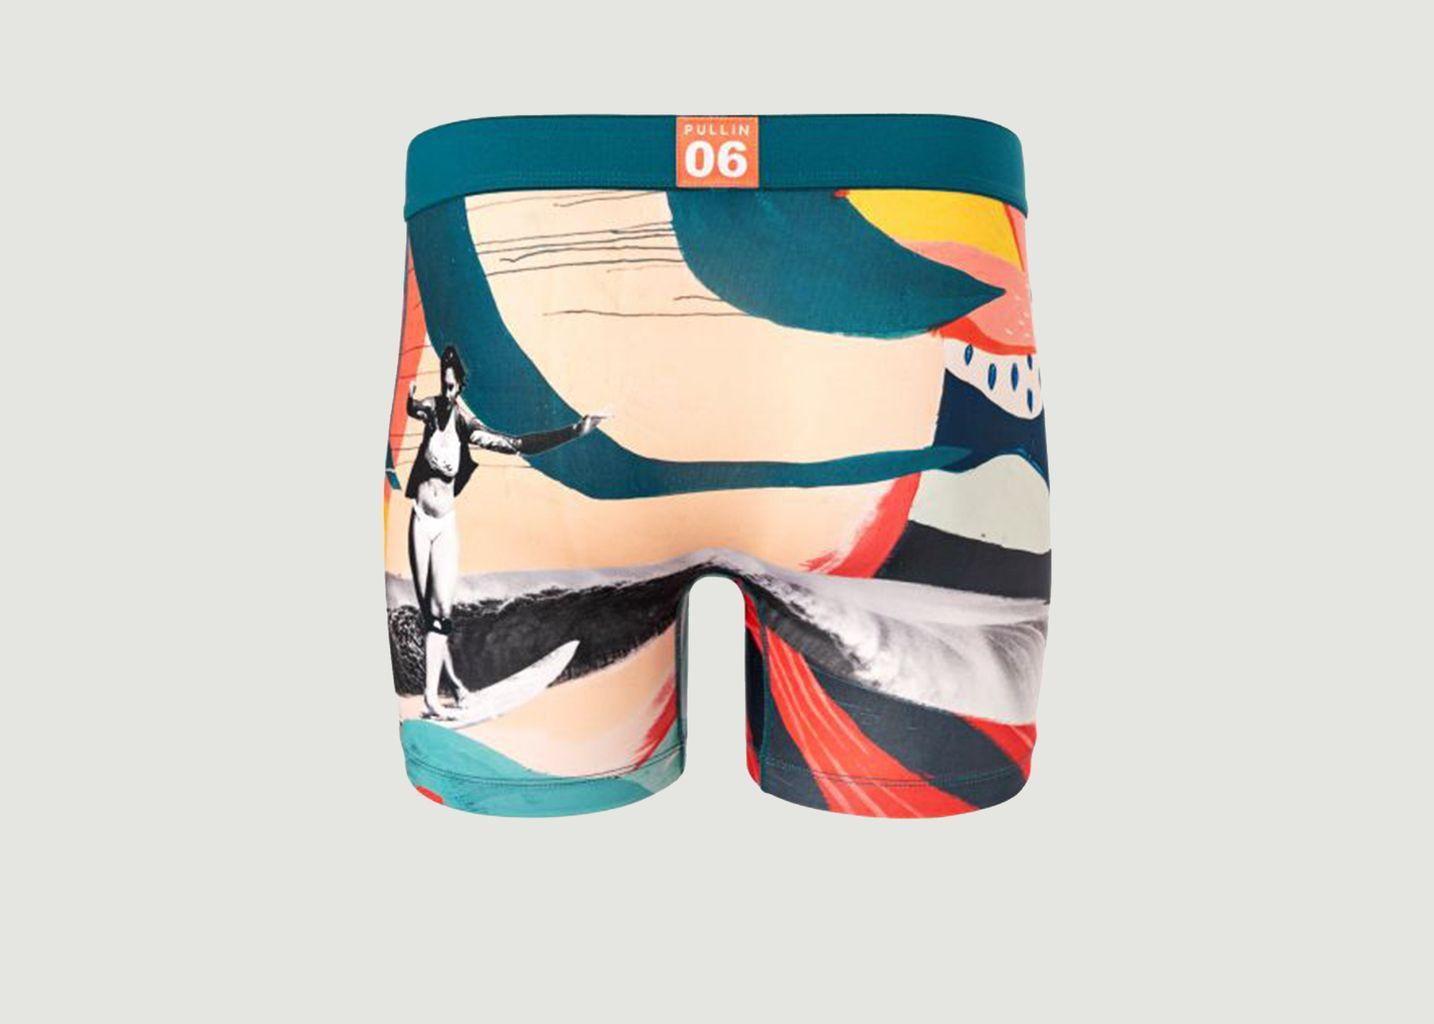 Boxer Fashion Lise - PULLIN